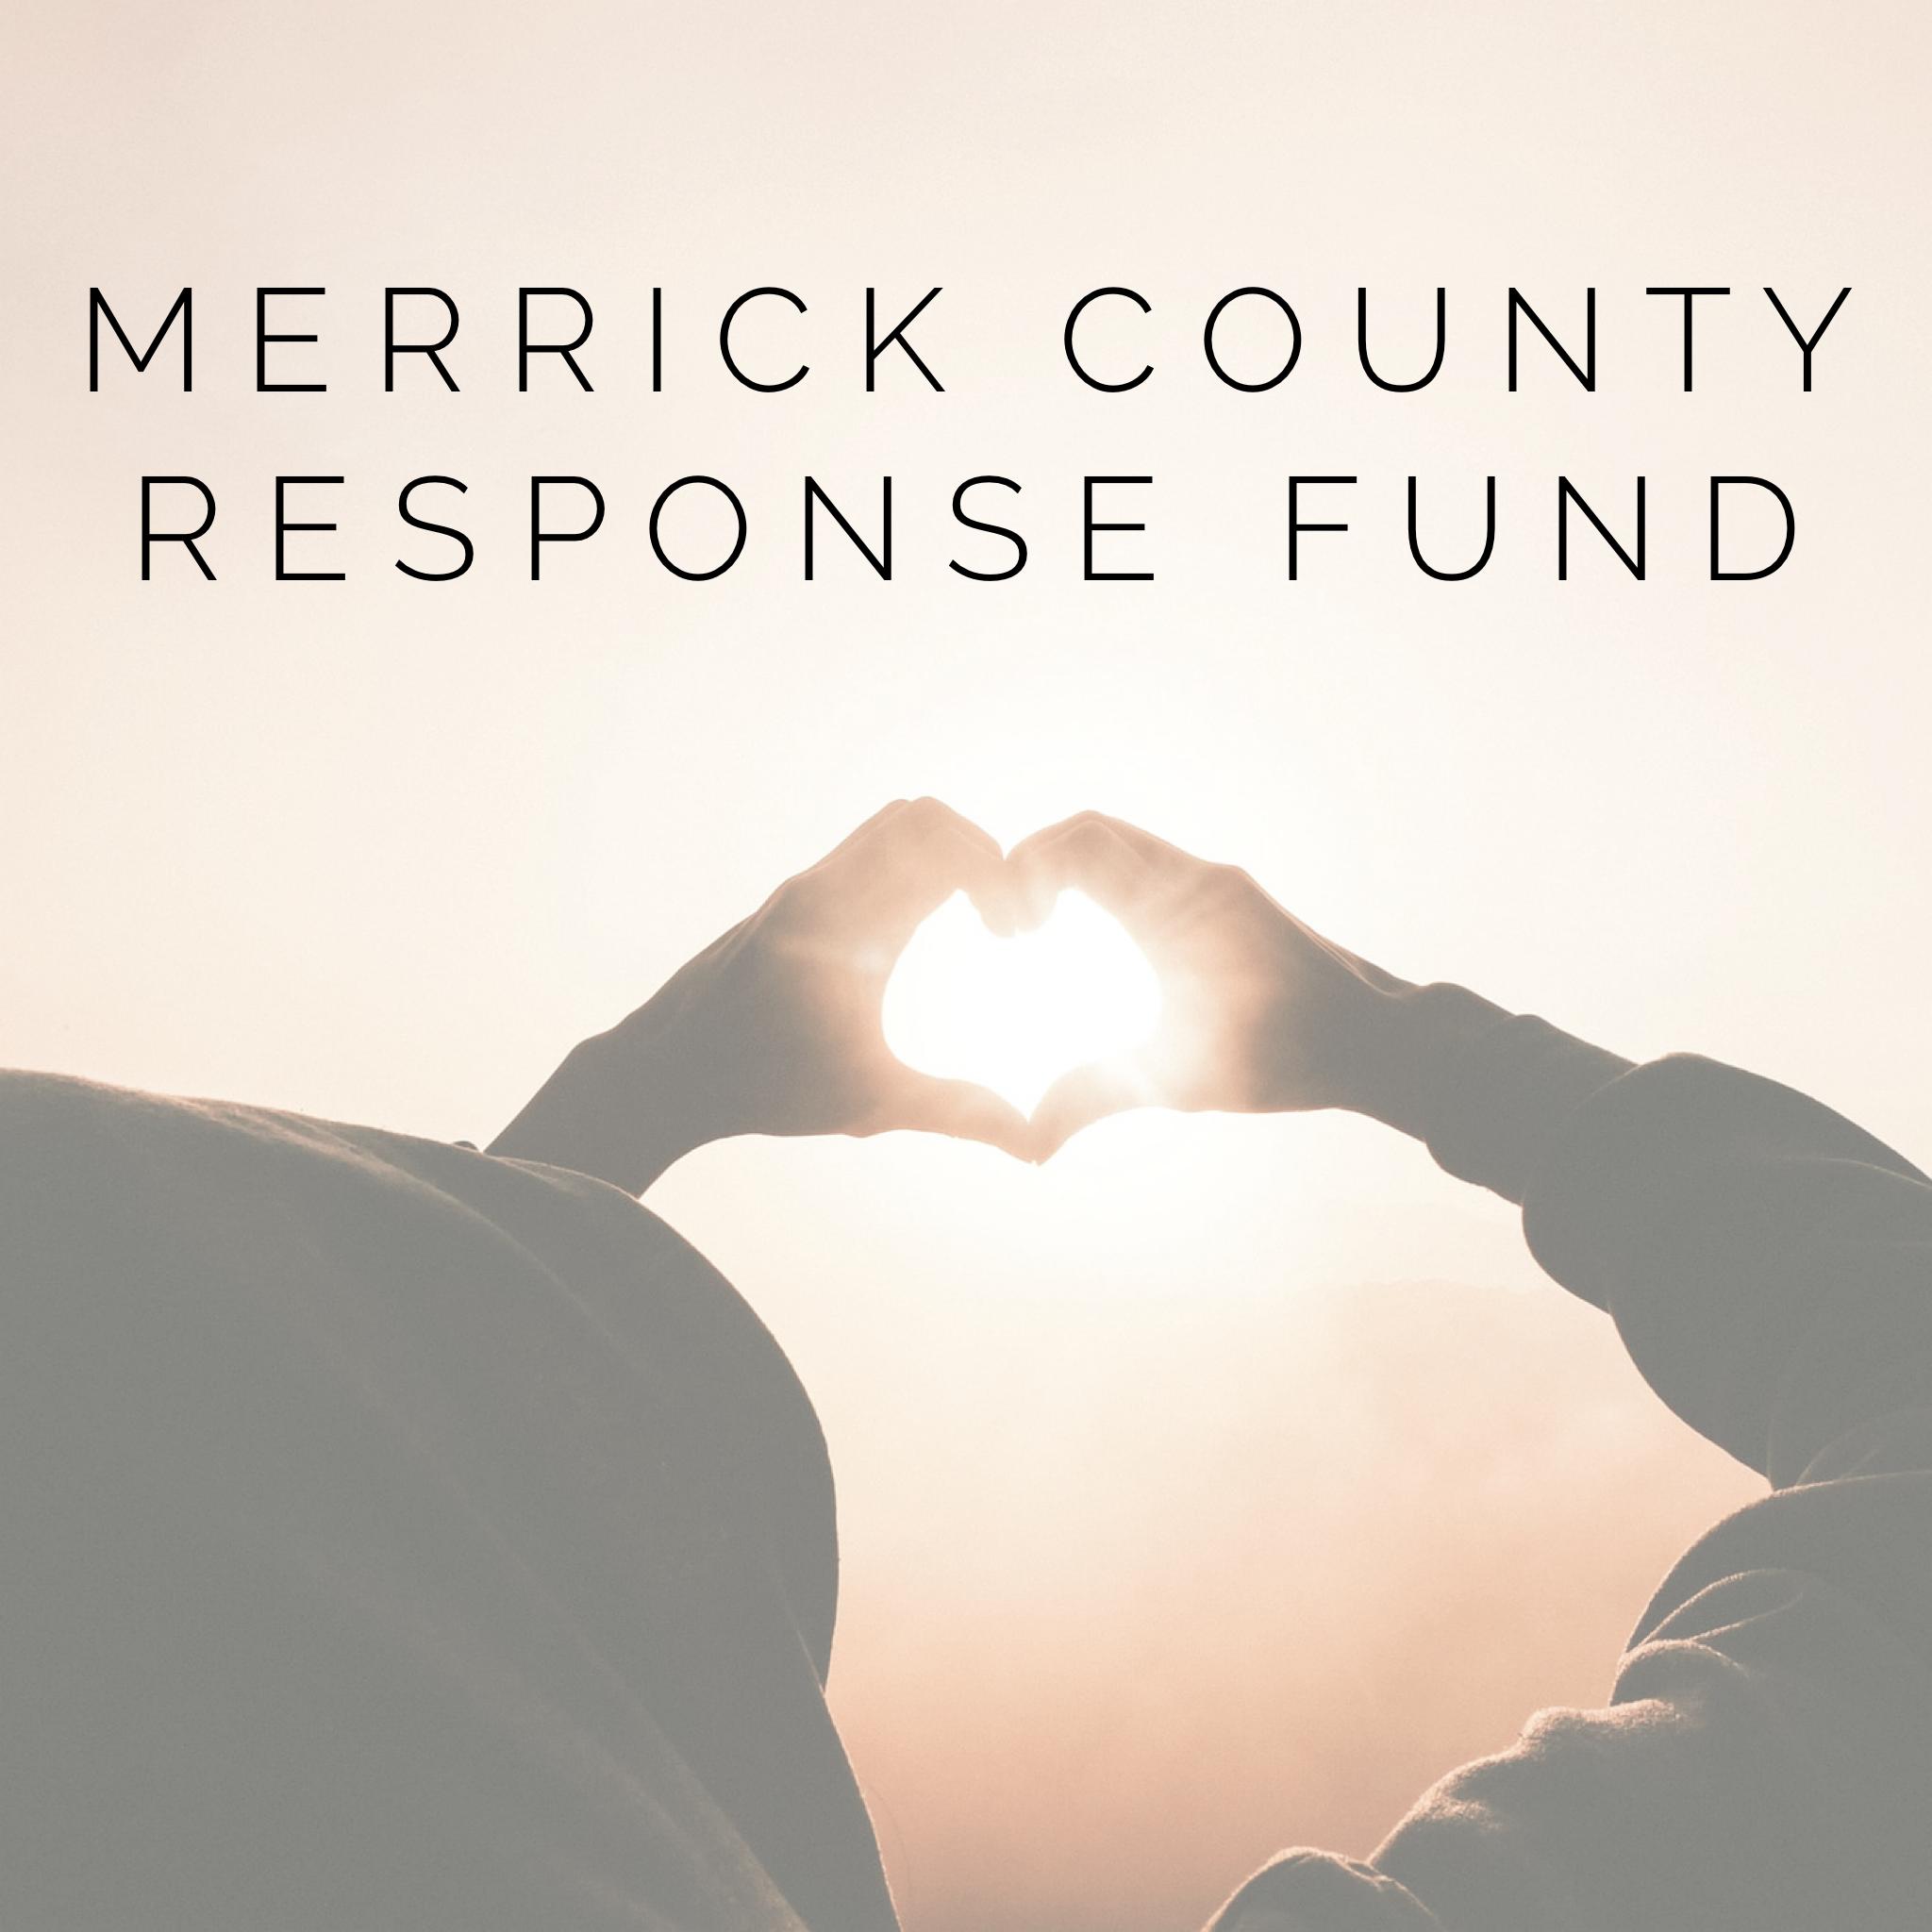 Merrick County Response Fund